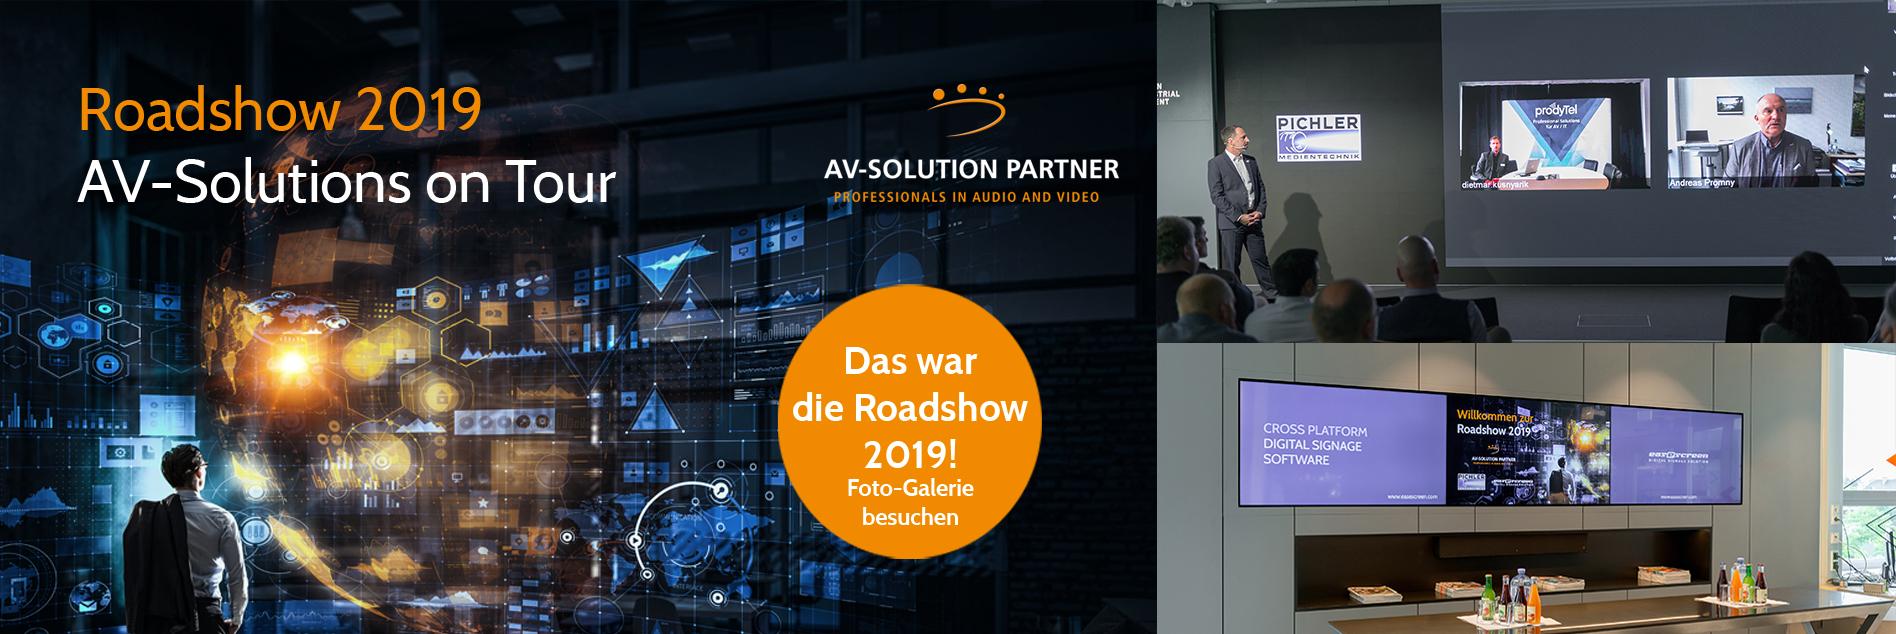 Header Bild, easescreen, Pichler Medientechnik Roadshow 2019